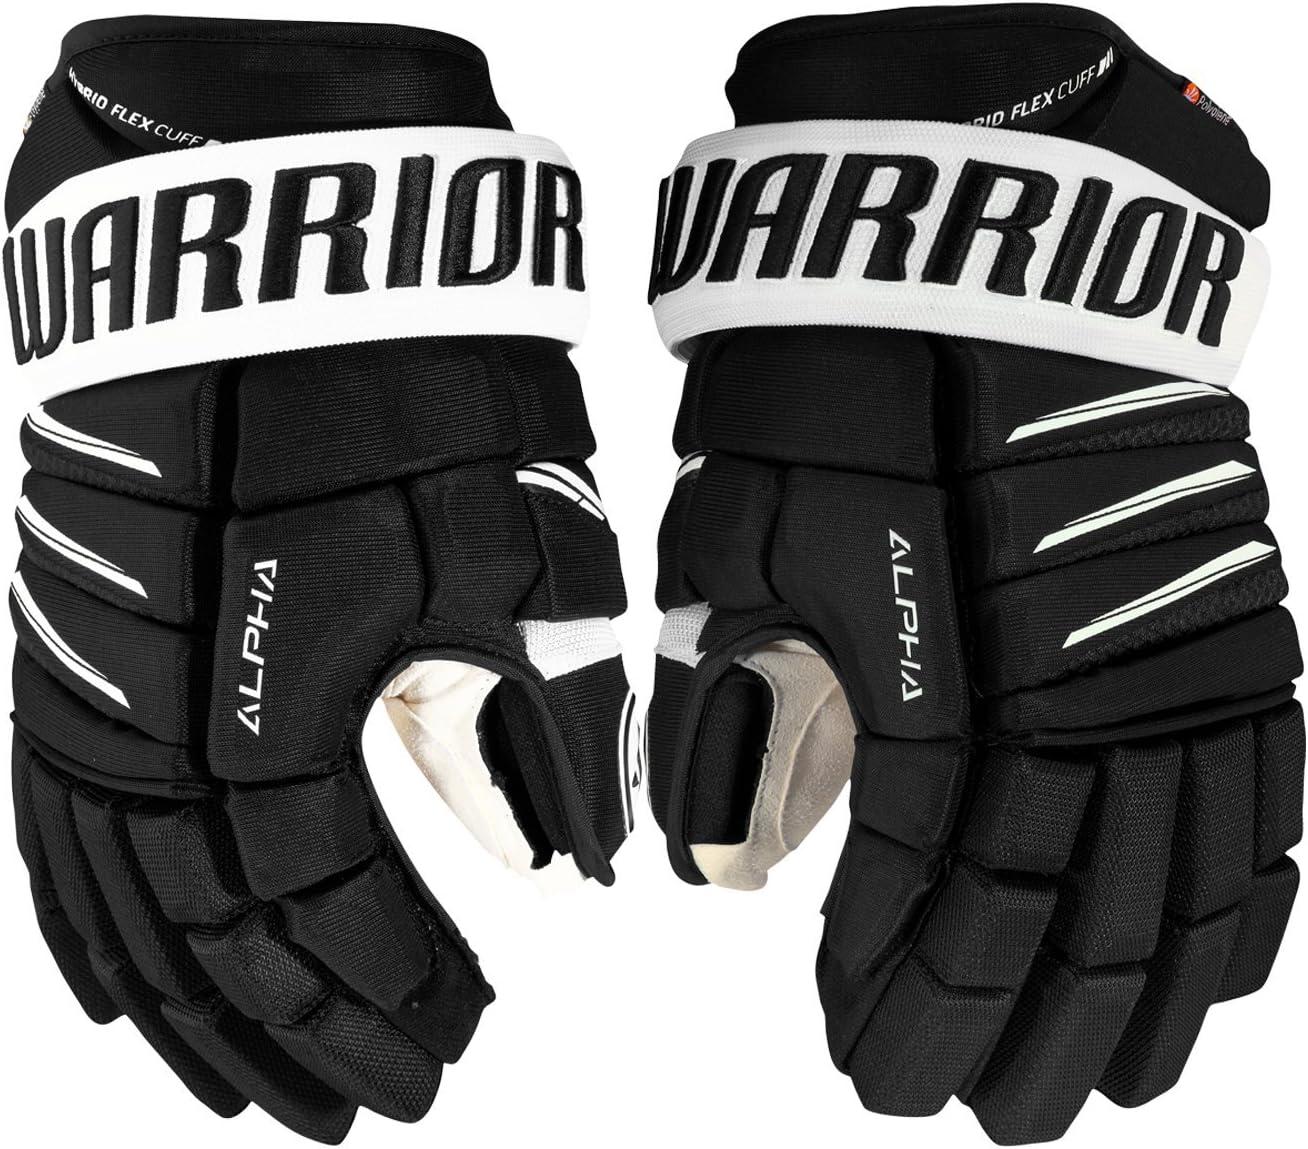 Warrior Senior Alpha Qx Pro Gloves : Sports & Outdoors